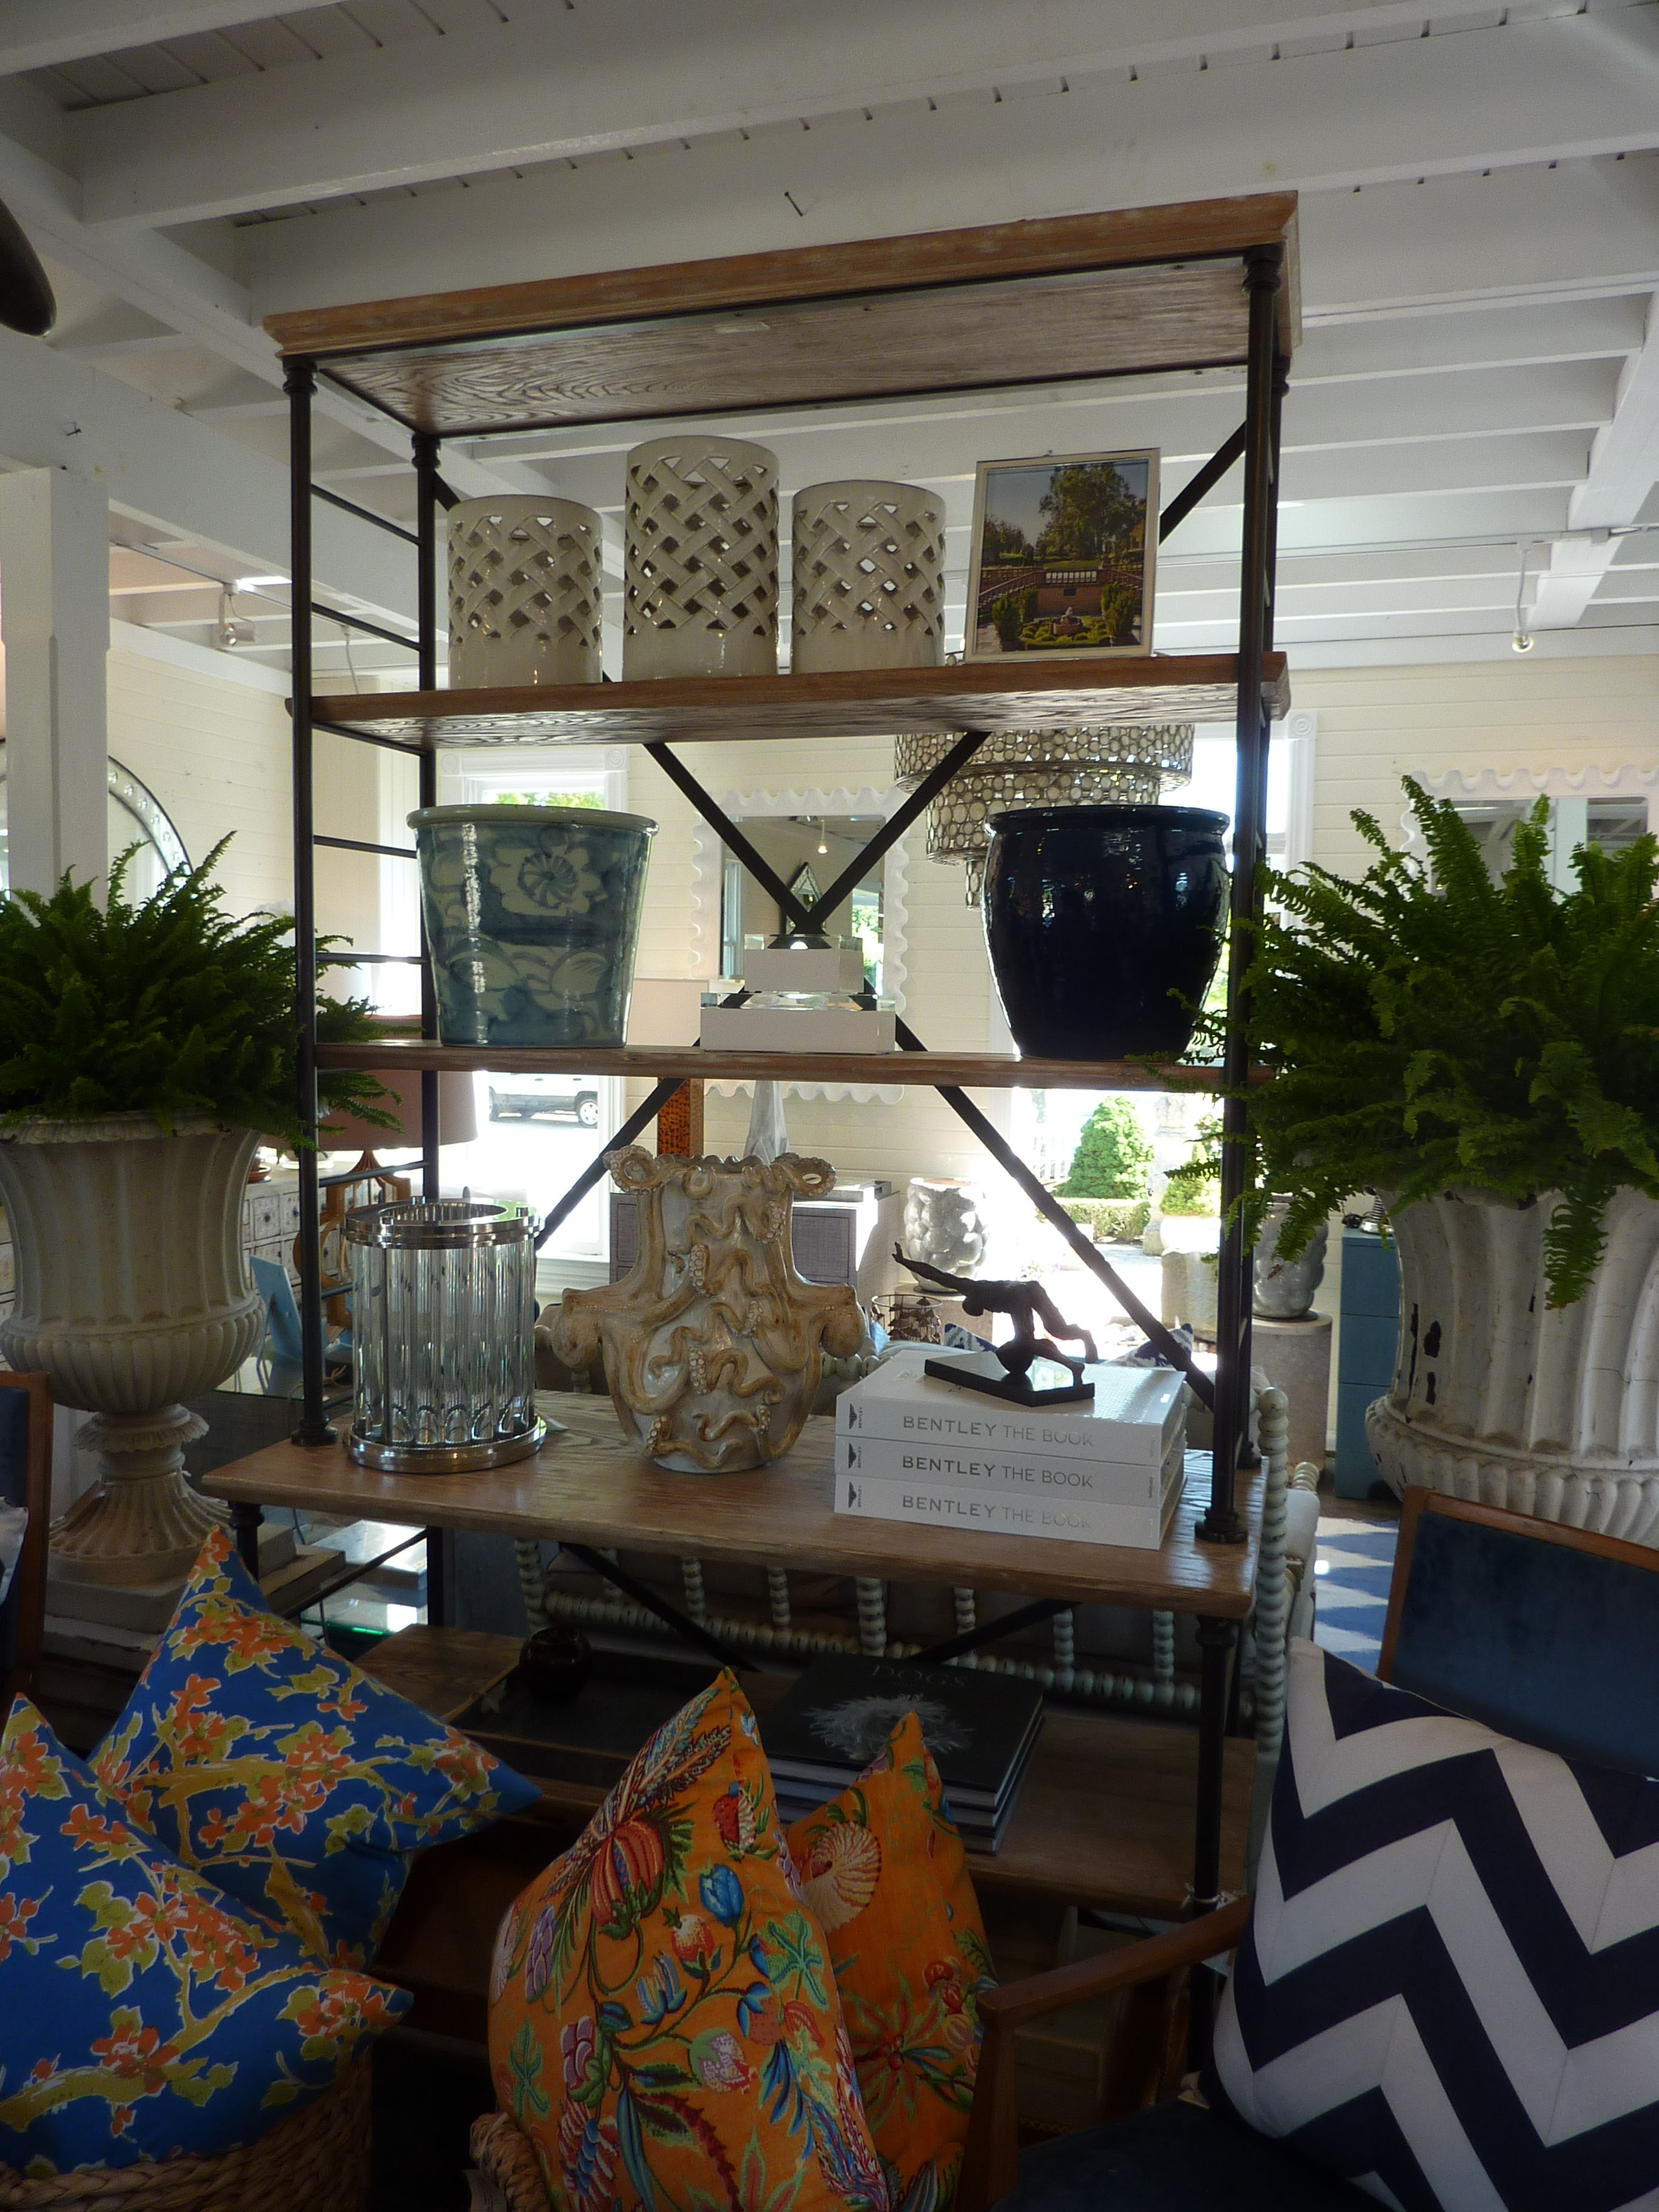 #Southampton #Mecox #interiordesign #MecoxGardens #furniture #shopping #home #decor #design #room #designidea #vintage #antiques #garden #Hamptons